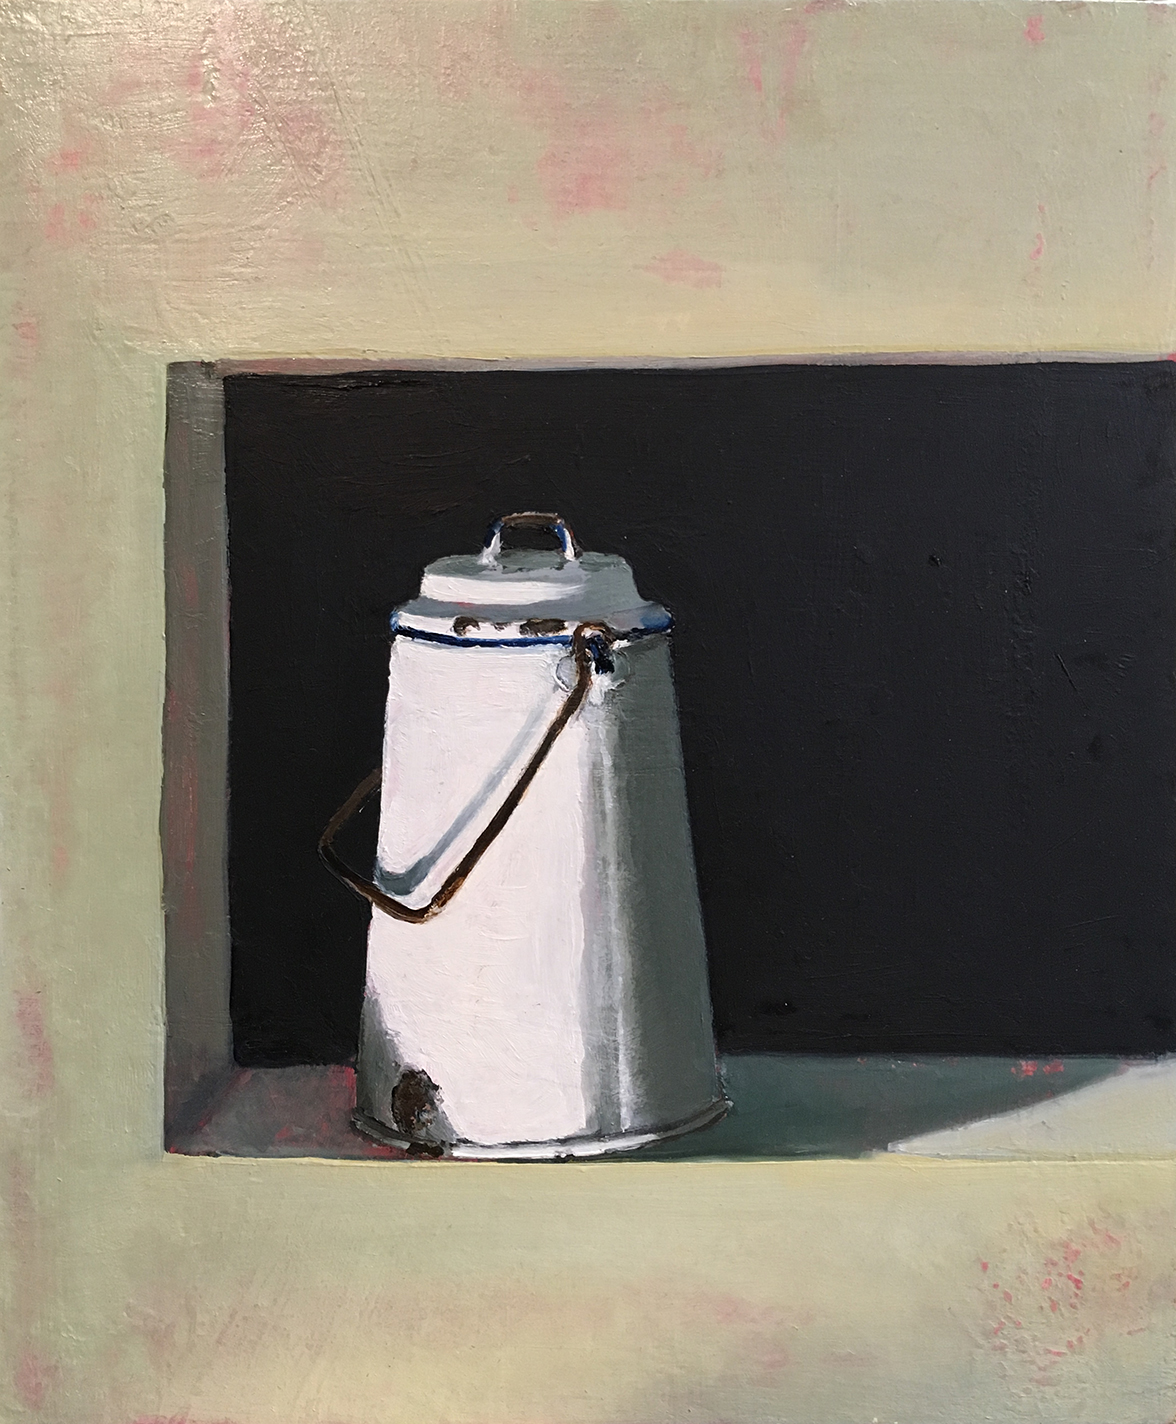 Artist: Tori Day  Title: The Night Larder  Size: 32.5 x 27.5 cm  Price: £550